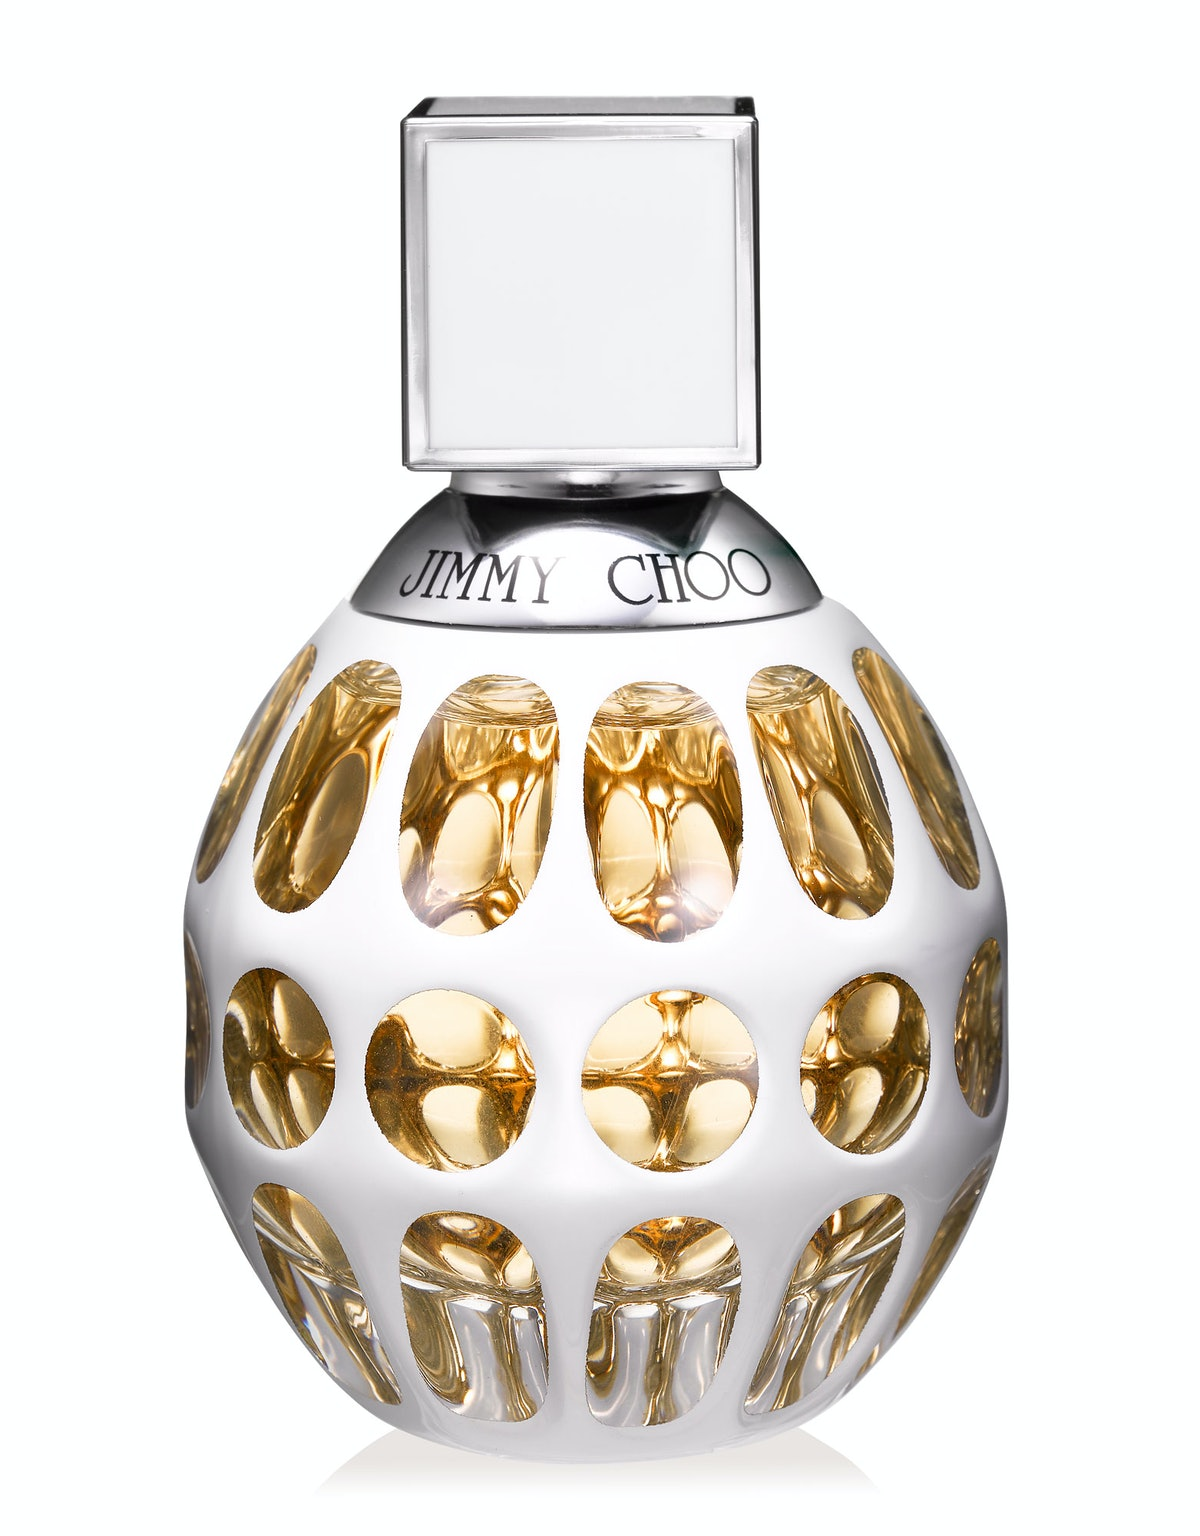 Jimmy Choo White Edition fragrance, $150, [macys.com](http://rstyle.me/~15FXR).